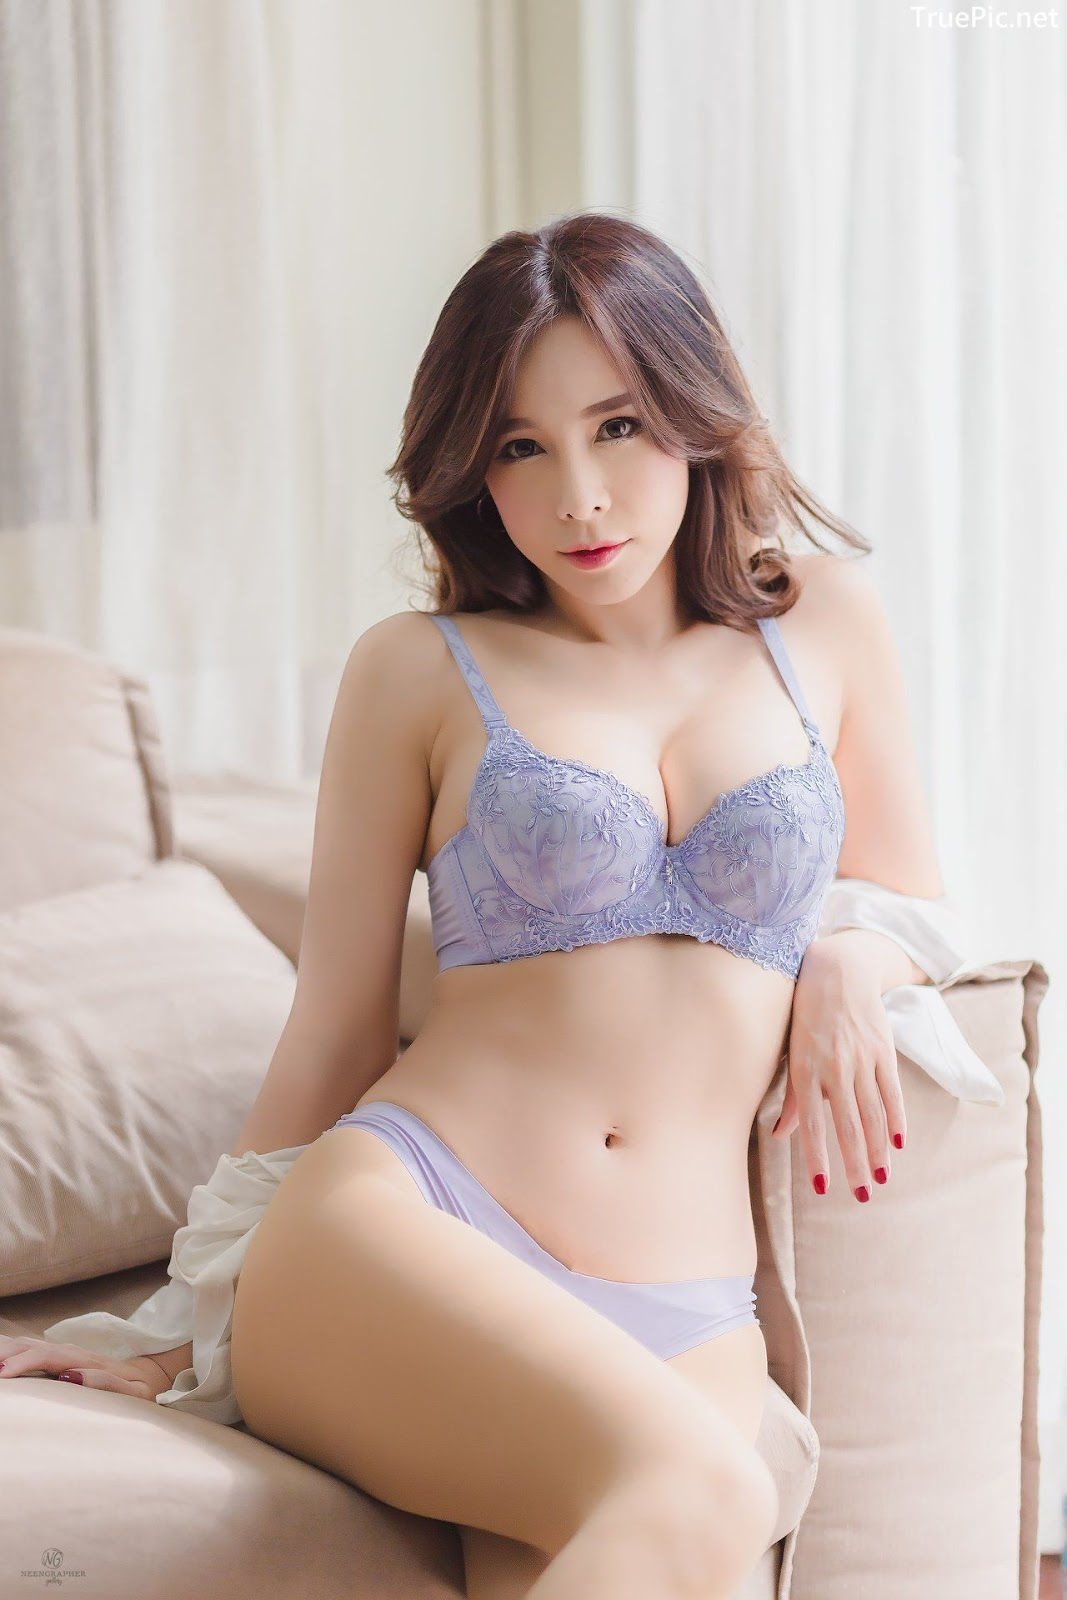 Image-Thailand-Hot-Model-Skykikijung-Purple-Lingerie-TruePic.net- Picture-6